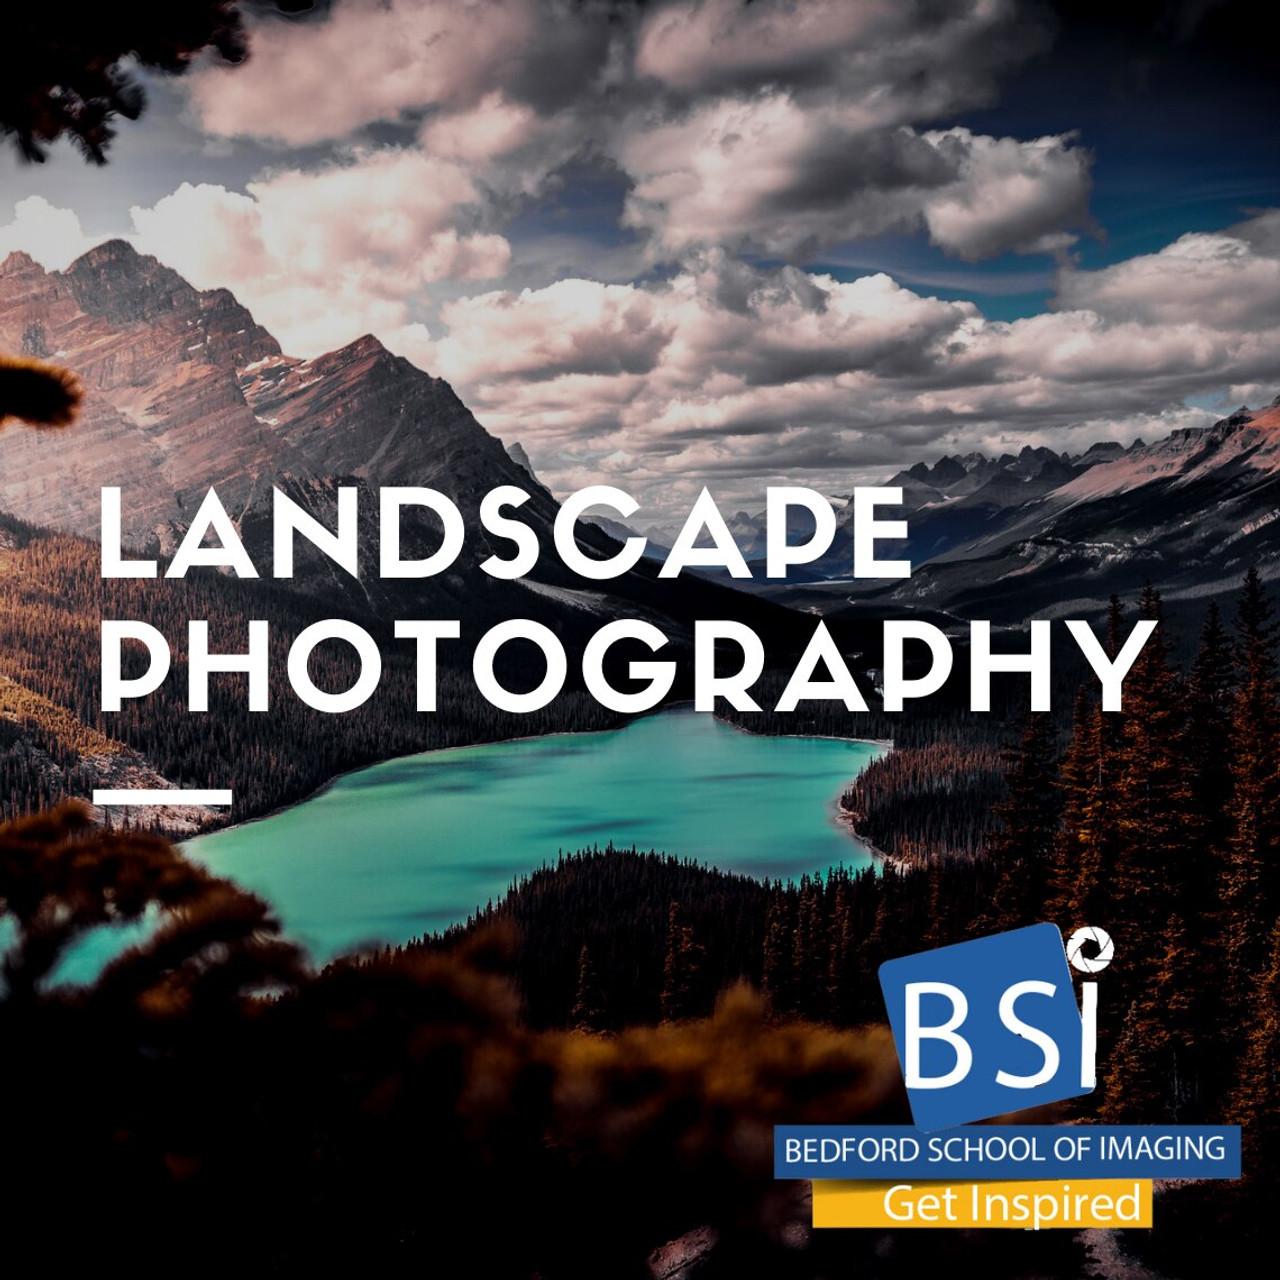 204. Landscape Photography Workshop & Field Trip - Little Rock